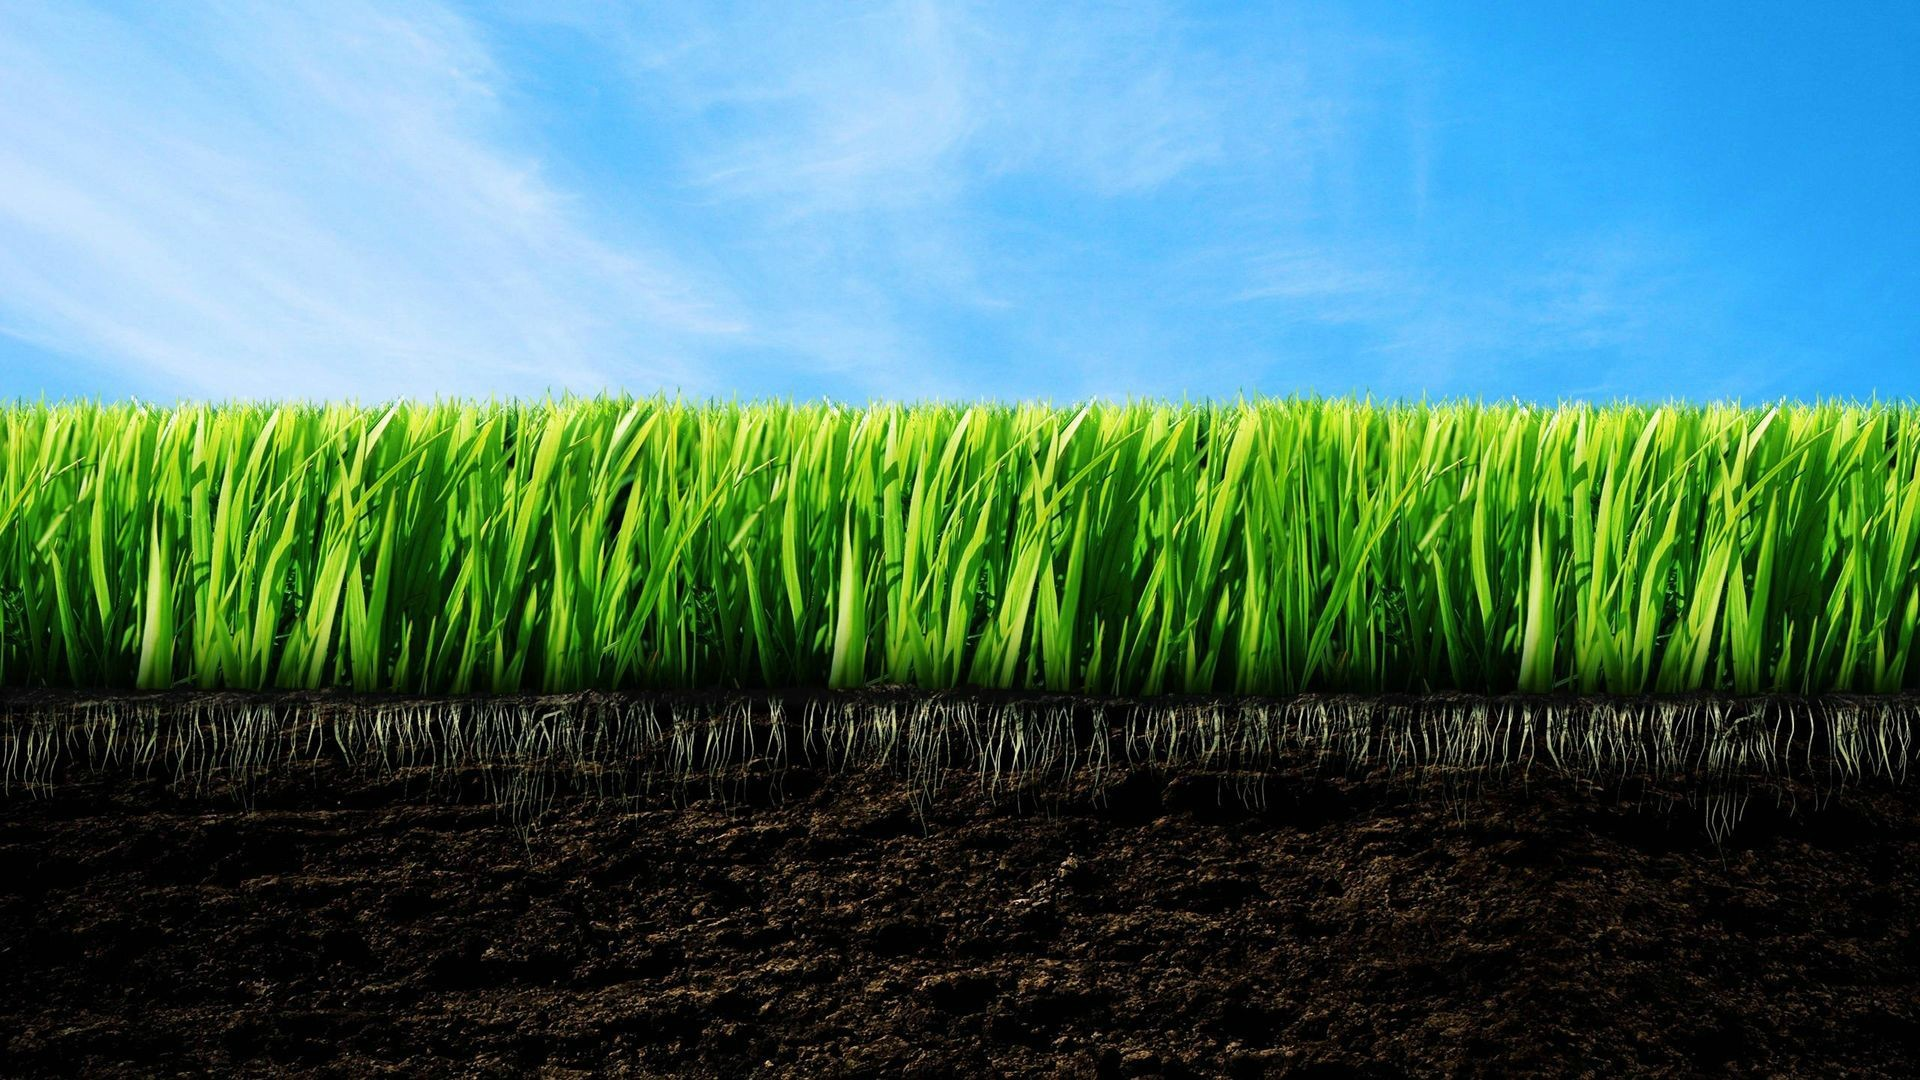 General 1920x1080 lawns grass digital art dirt plants sky blue green brown roots